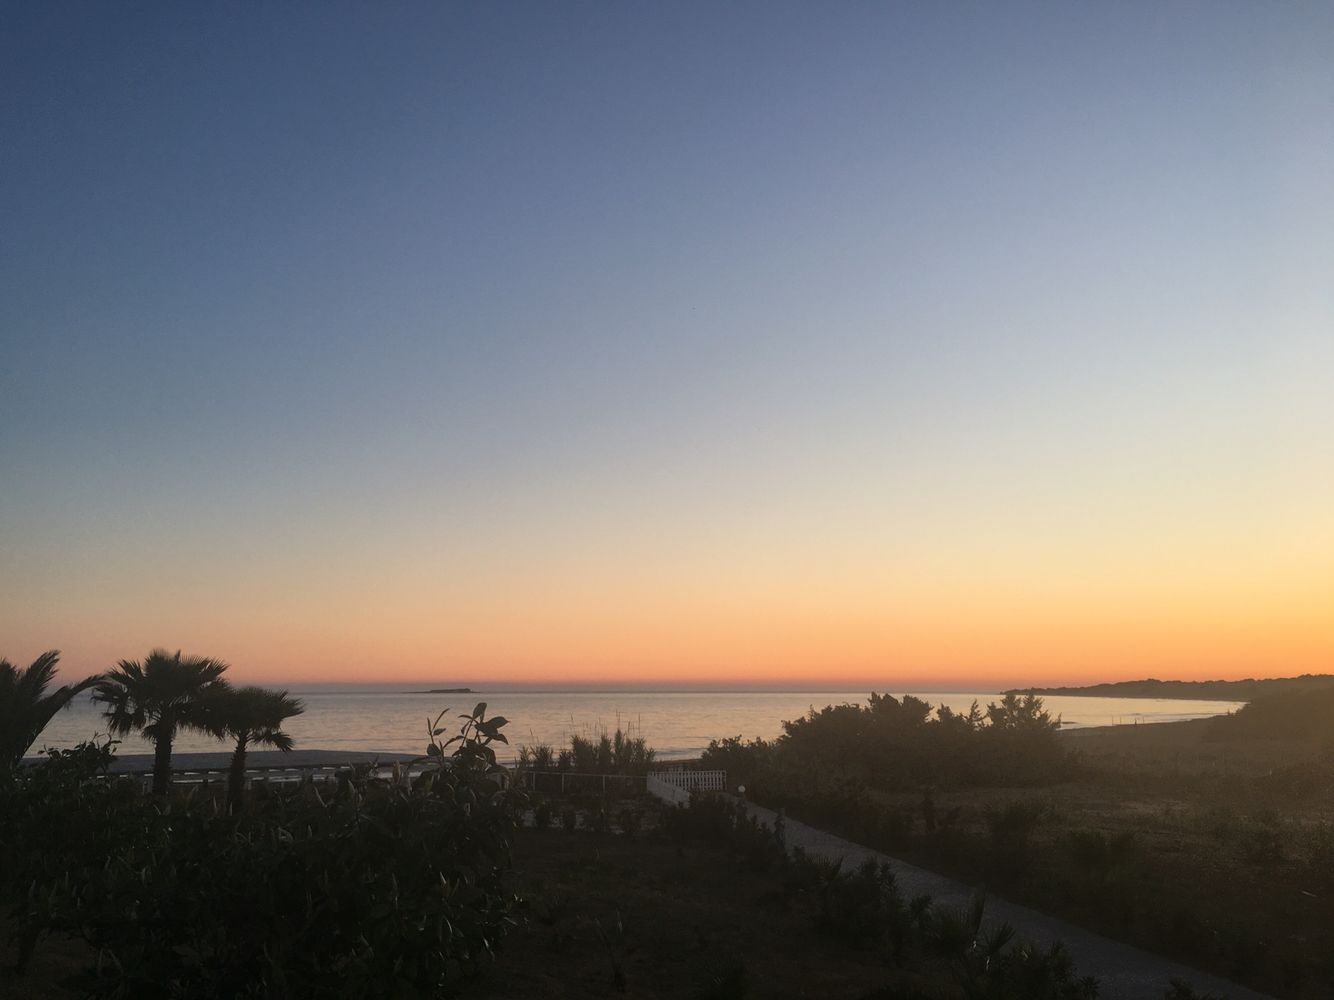 Sunset on the beach; Corfu, Greece